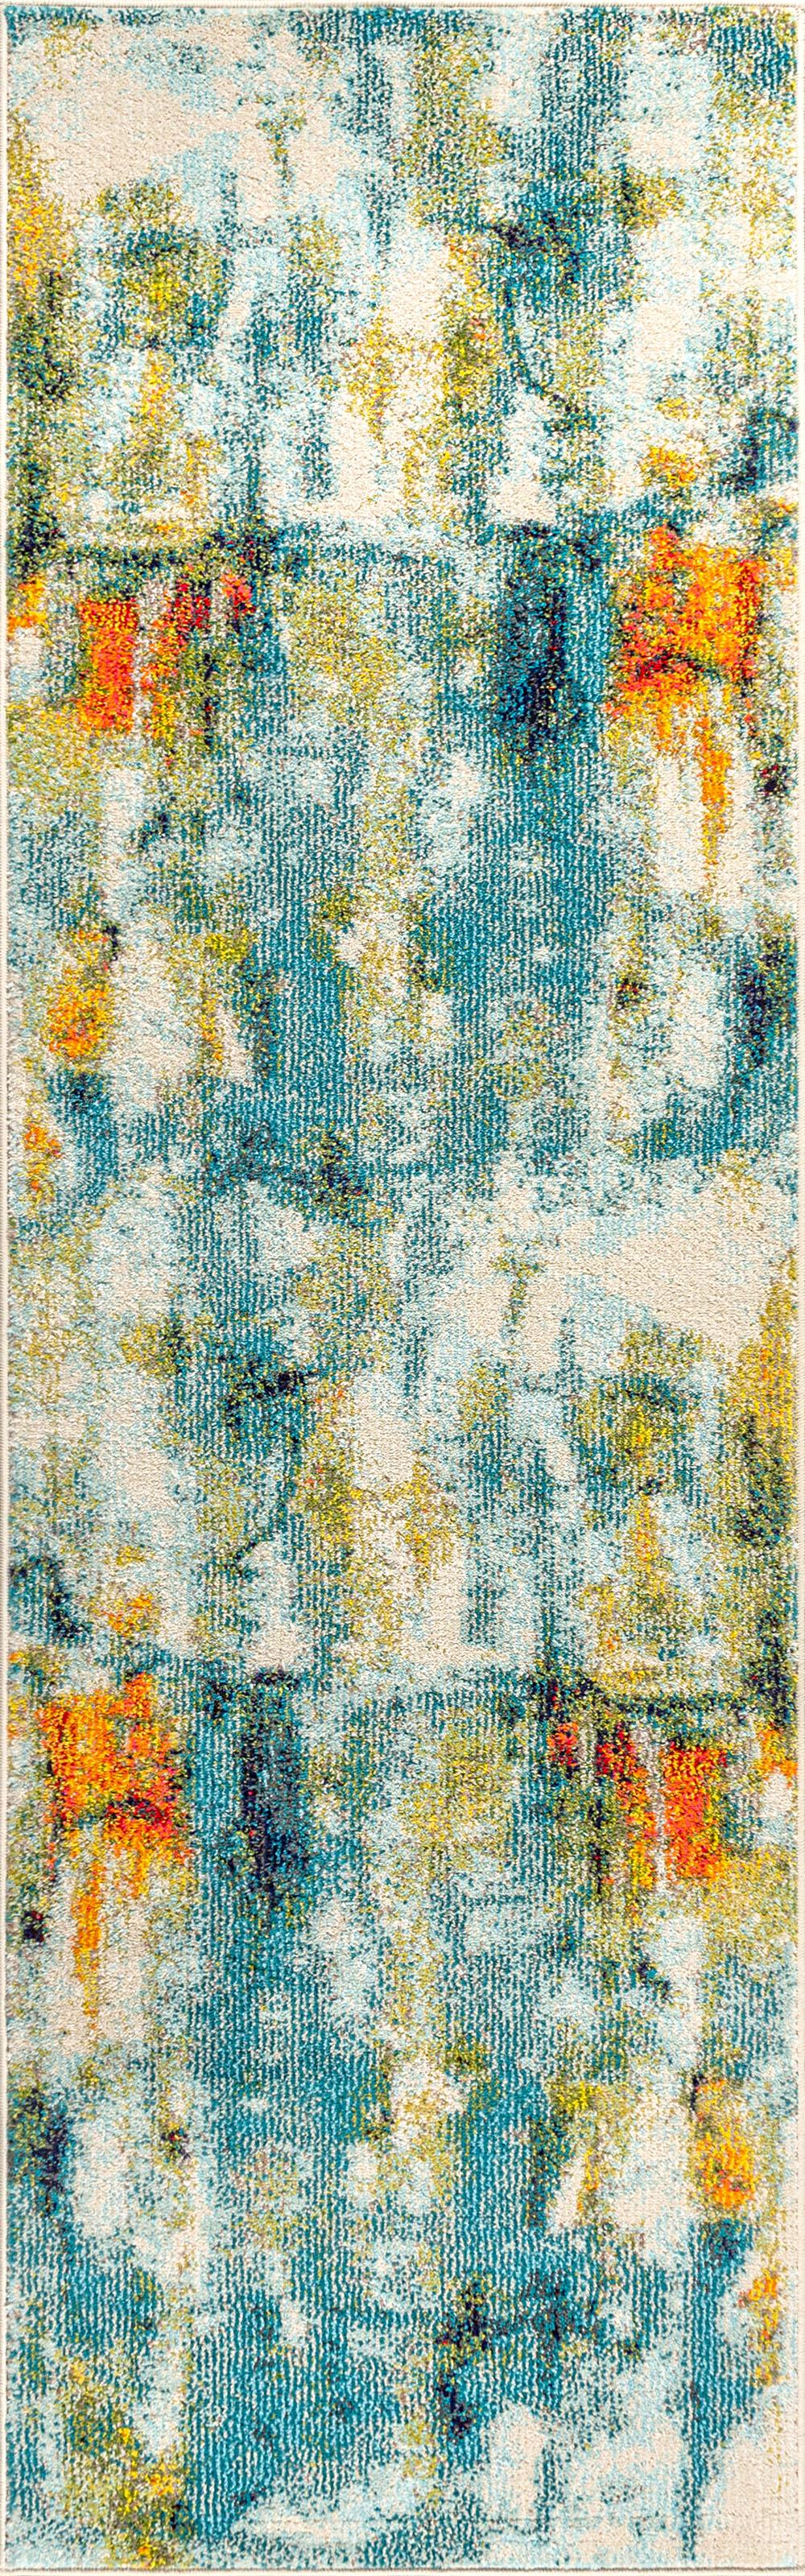 Contemporary POP Modern Abstract Waterfall Blue/Cream 2 ft. x 8 ft. Runner Rug